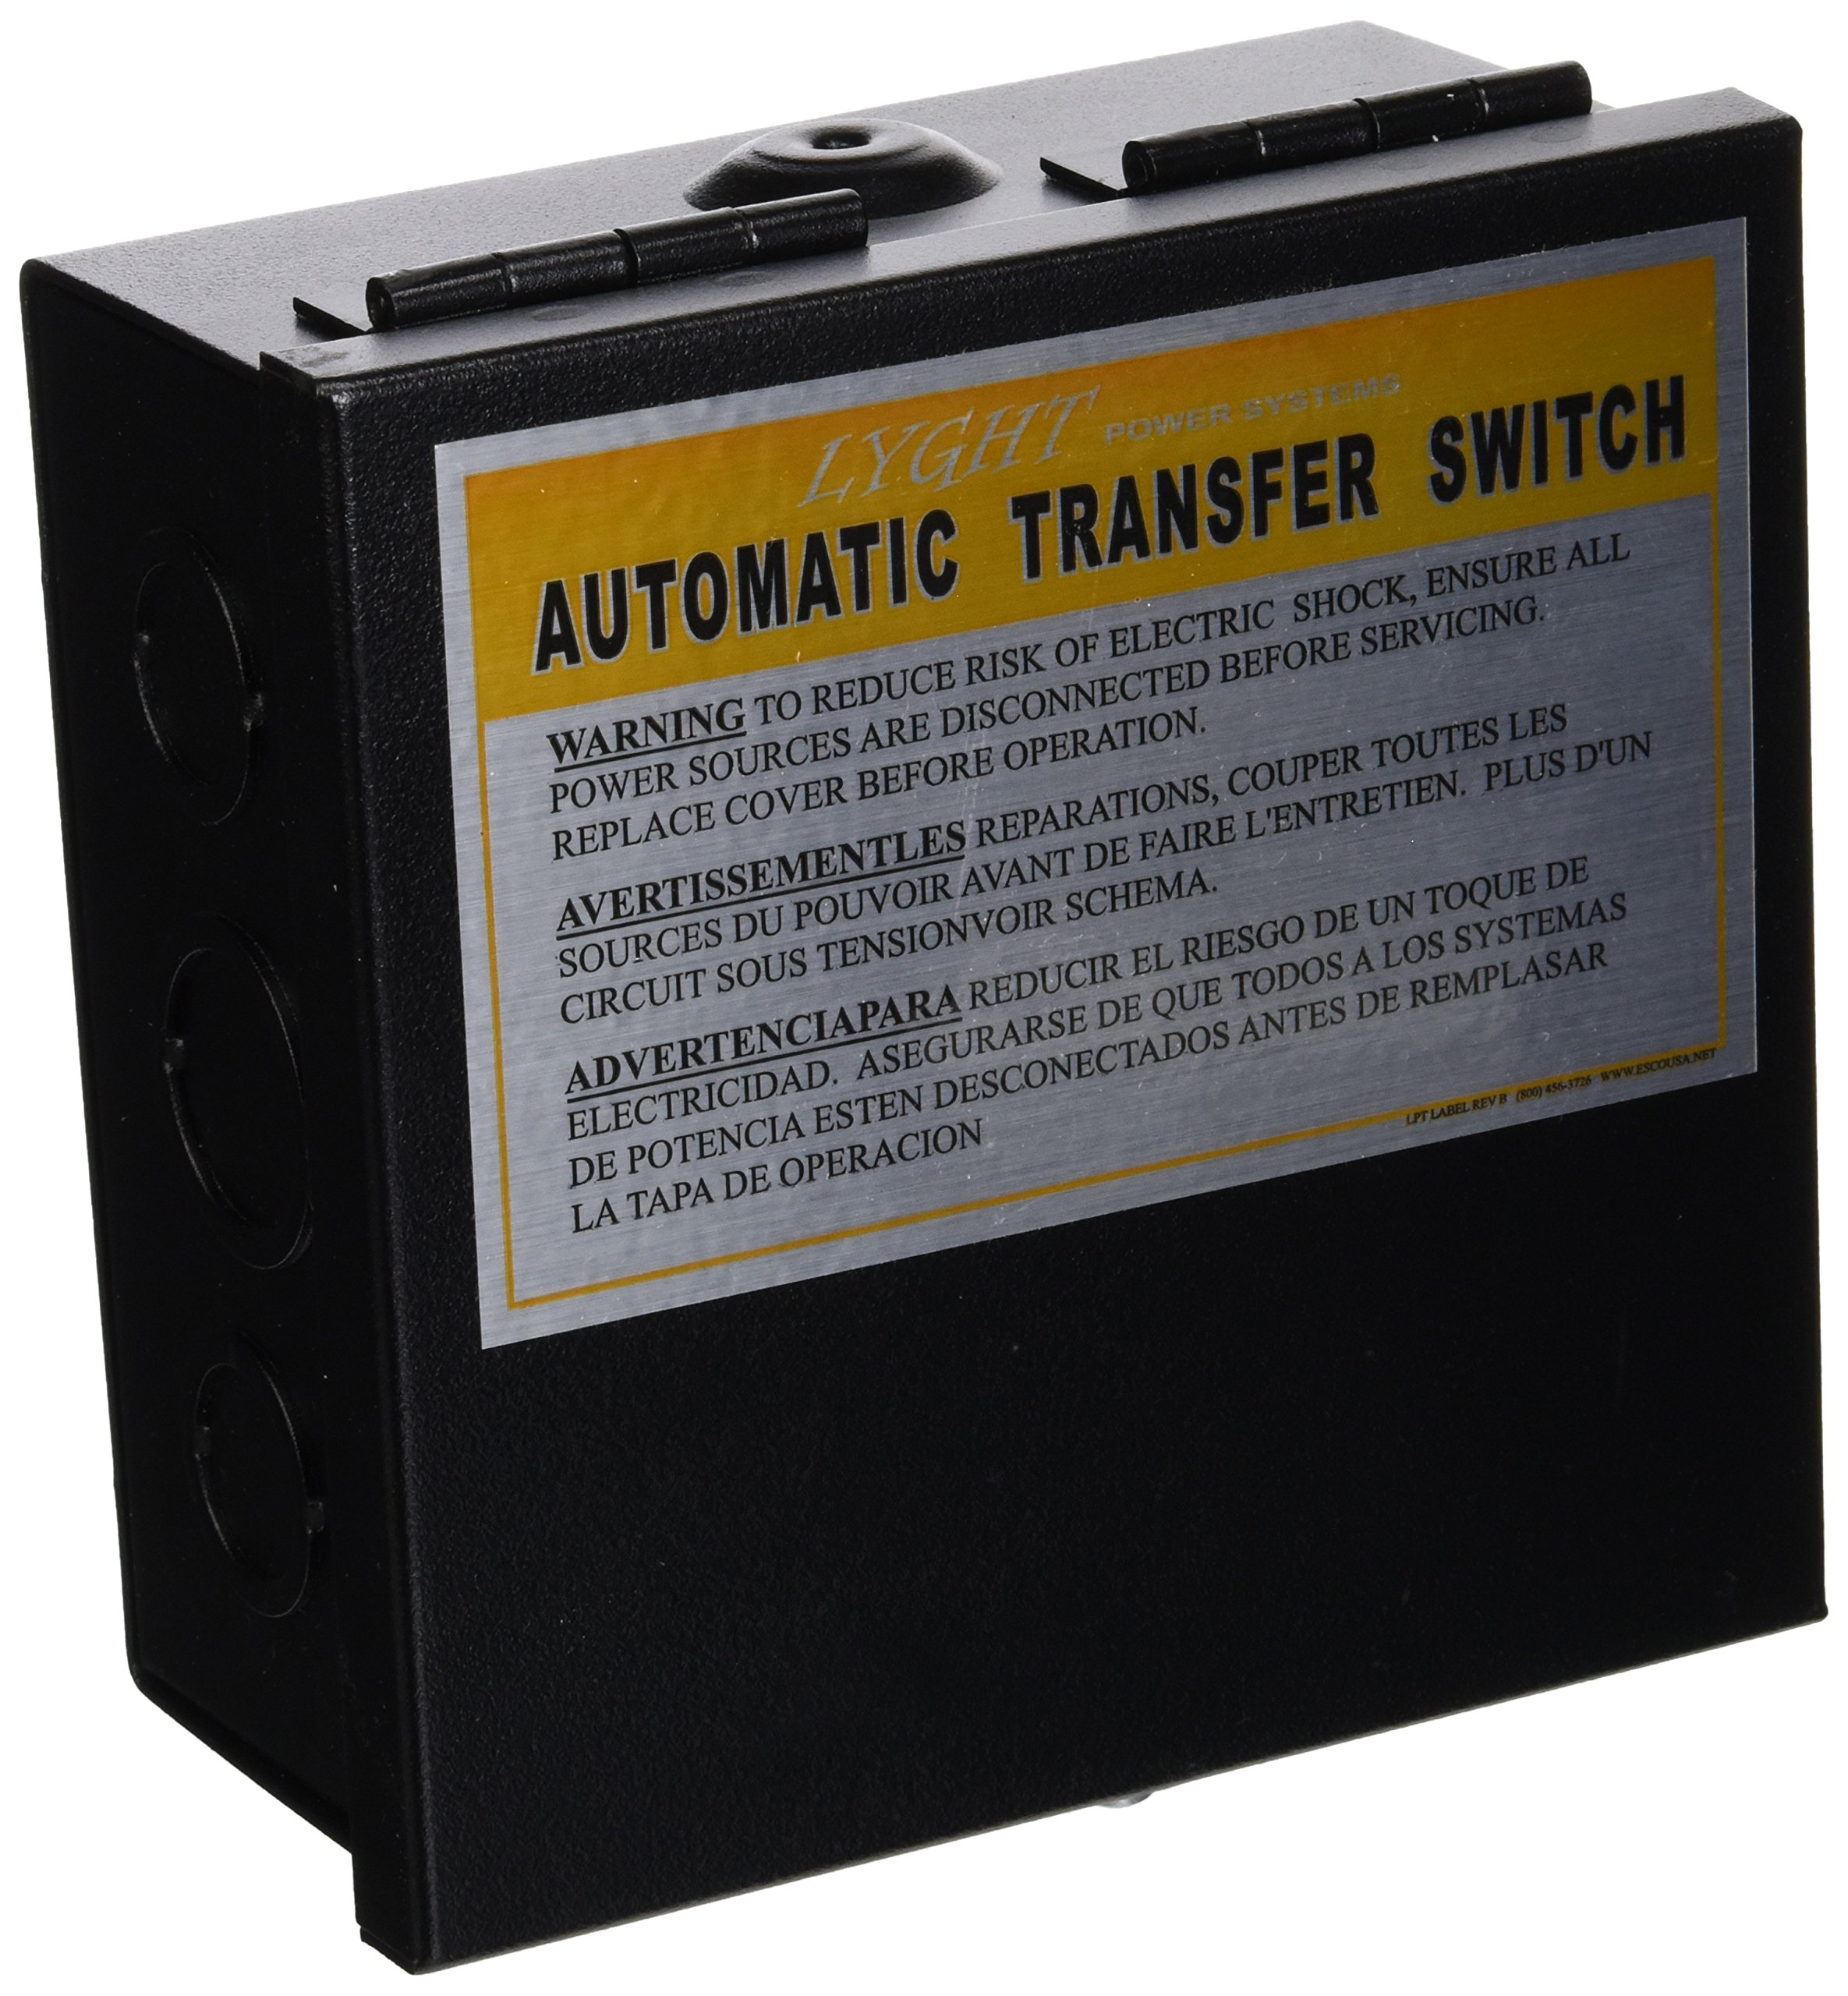 Elkhart LPT30 30A Transfer Switch